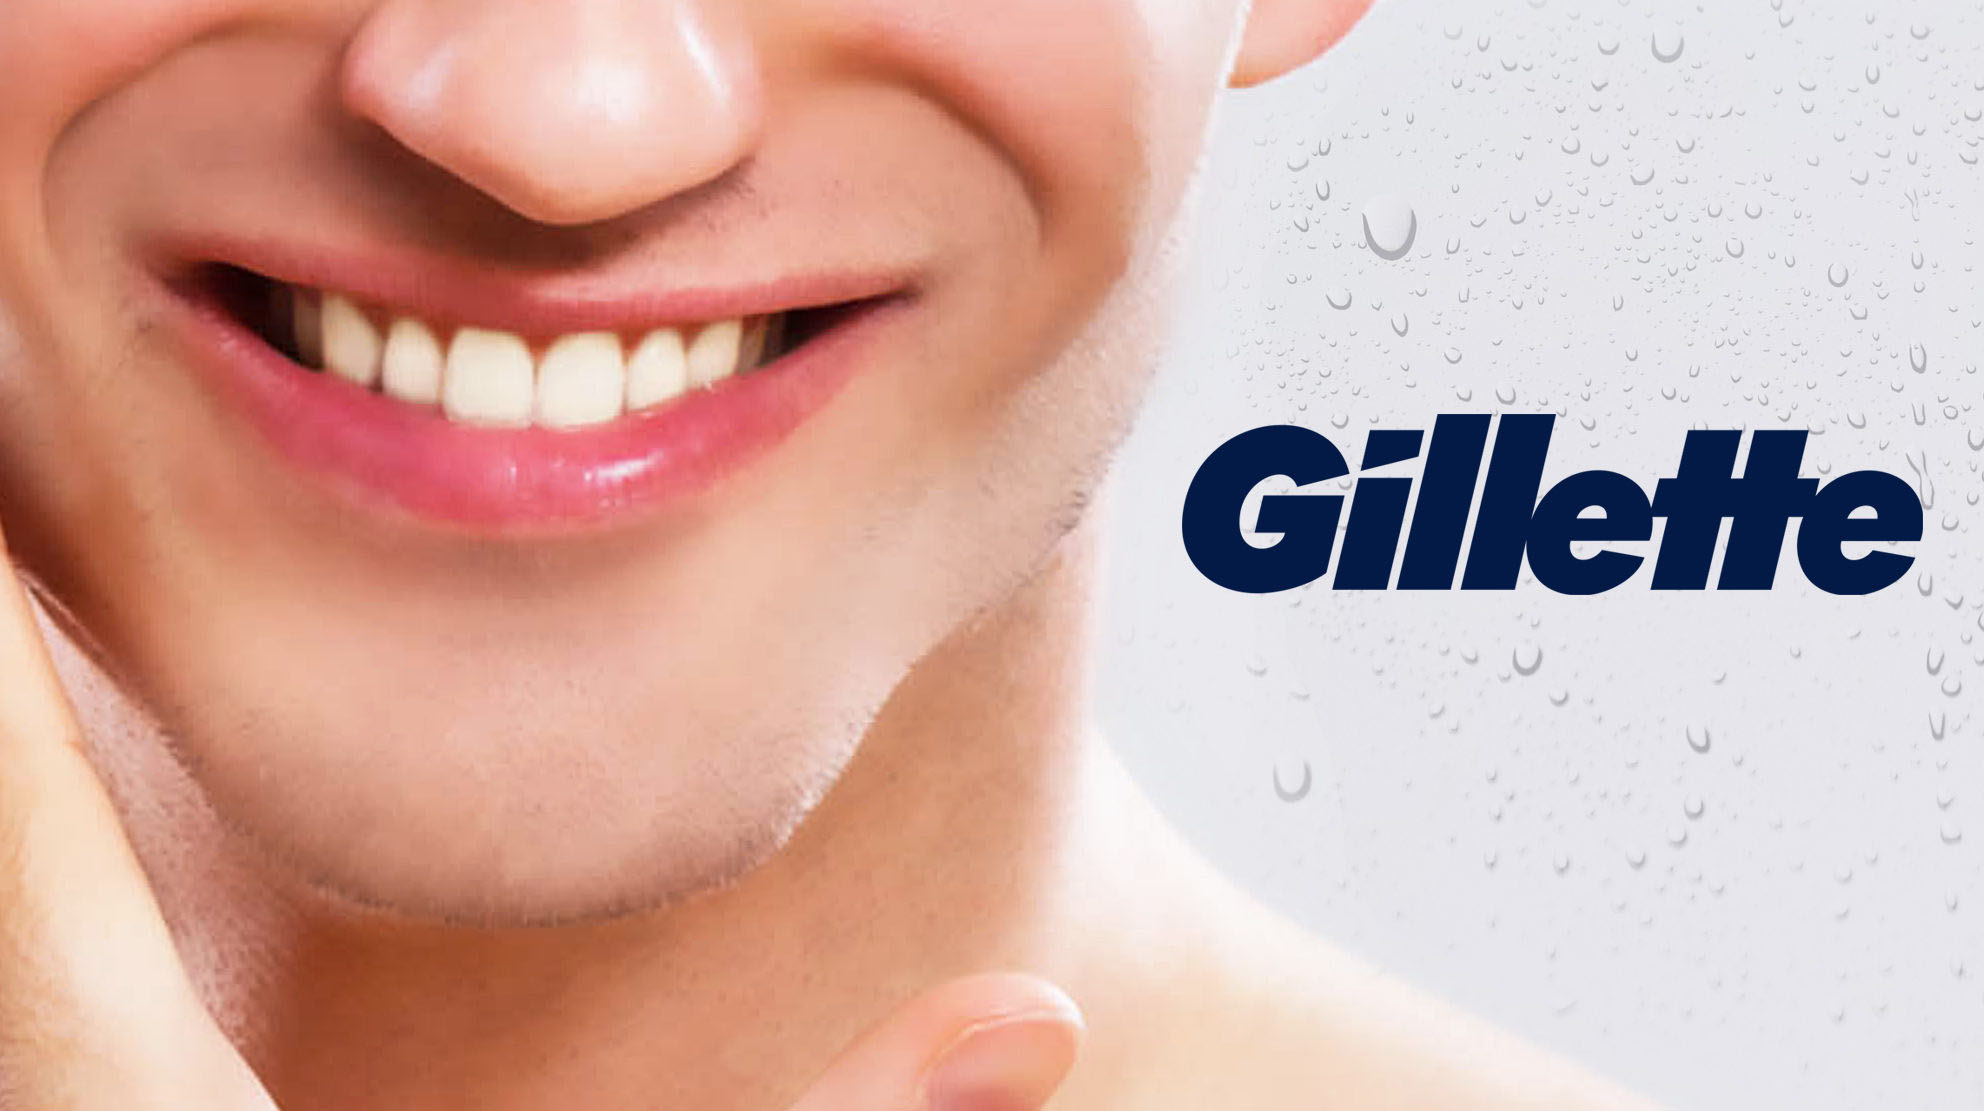 Gillette India Q3 net profit up 54 per cent at Rs 105.82 crore